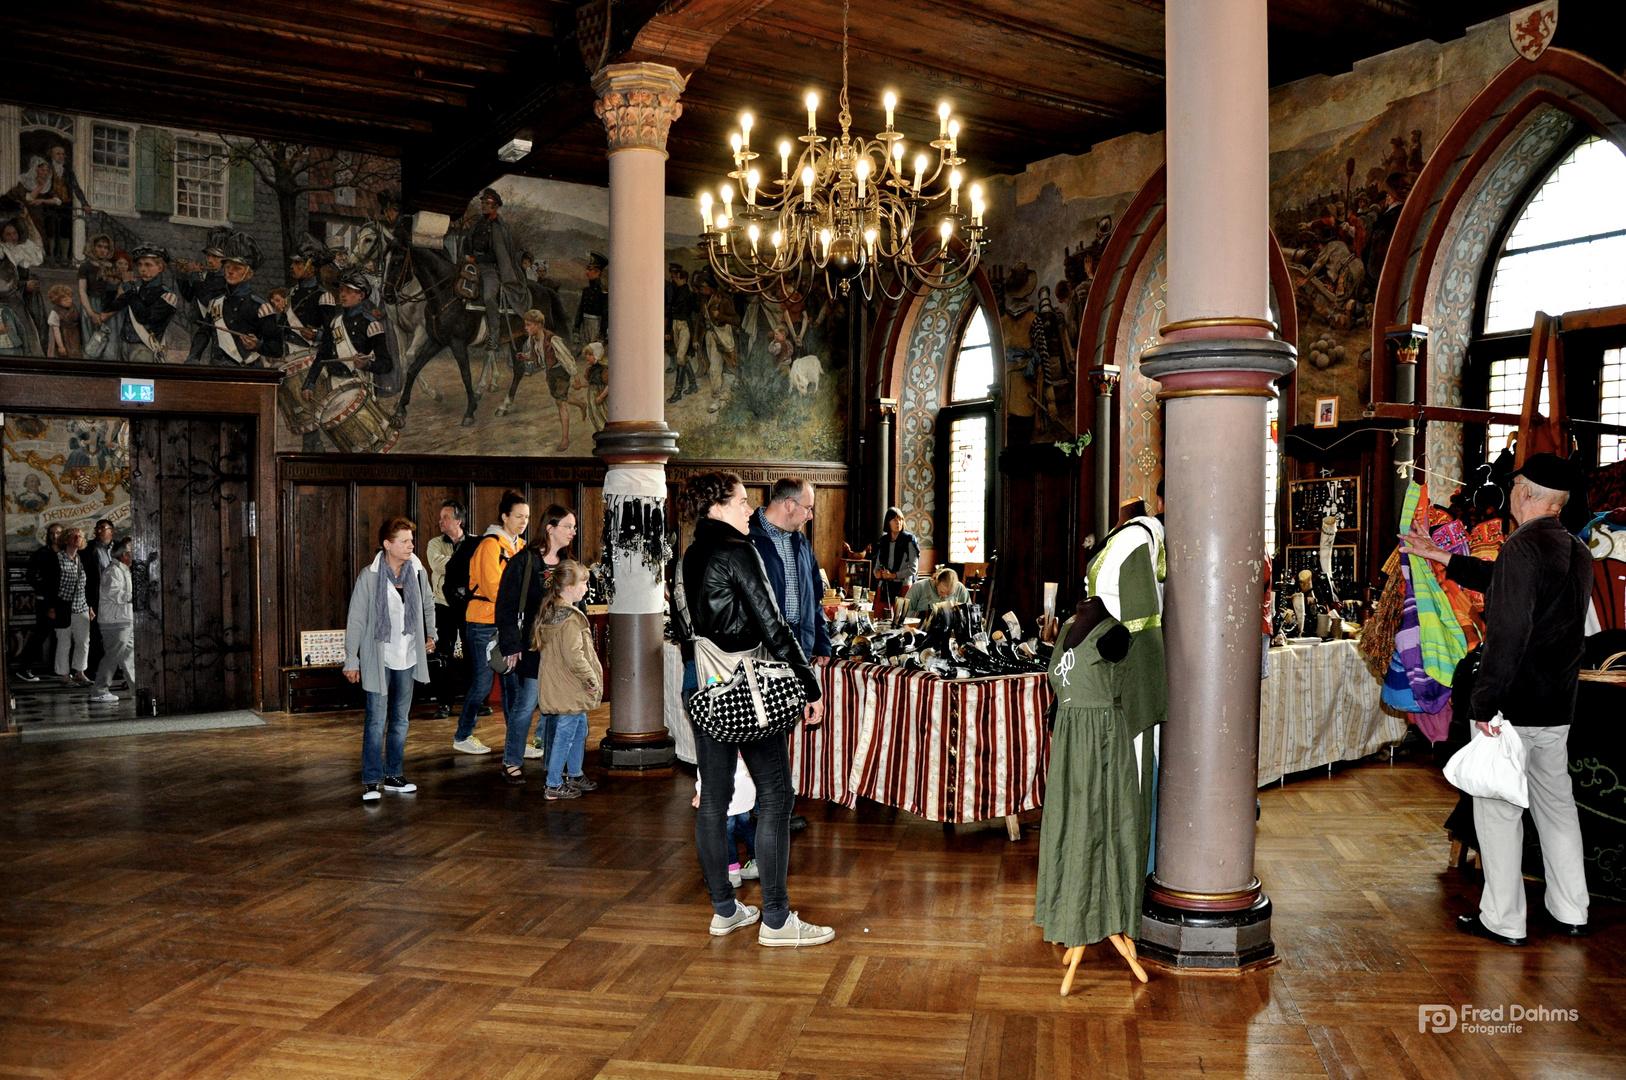 Schloss Burg, Mittelaltermarkt im Rittersaal